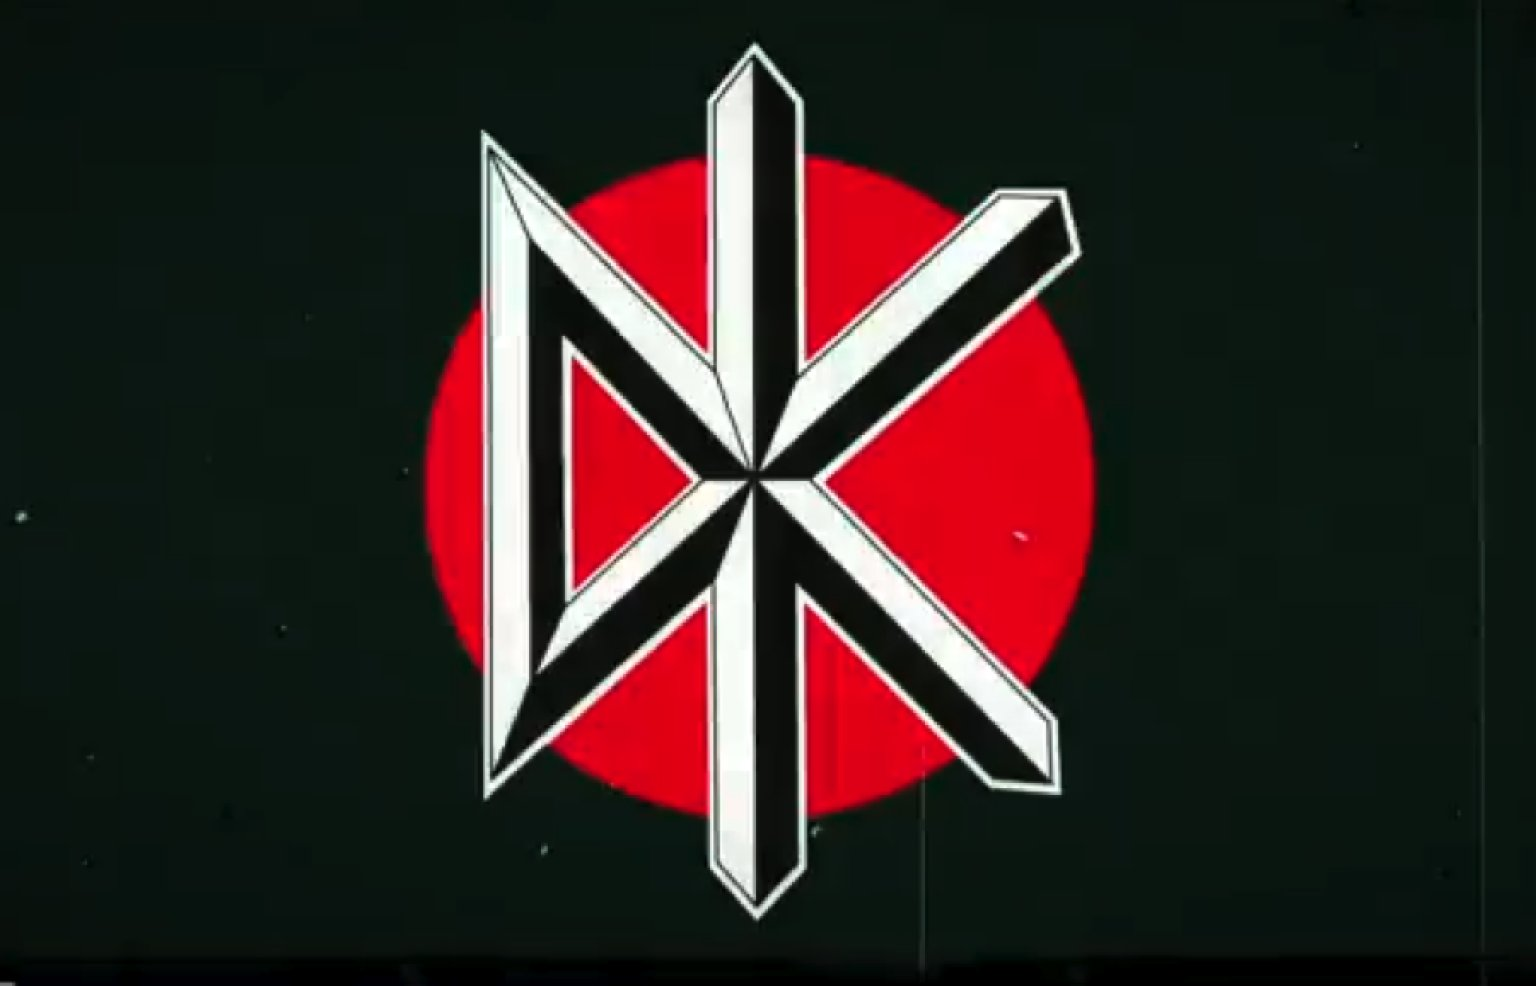 Dead Kennedys Amp The Art Of Punk Mocatv Series Spotlights